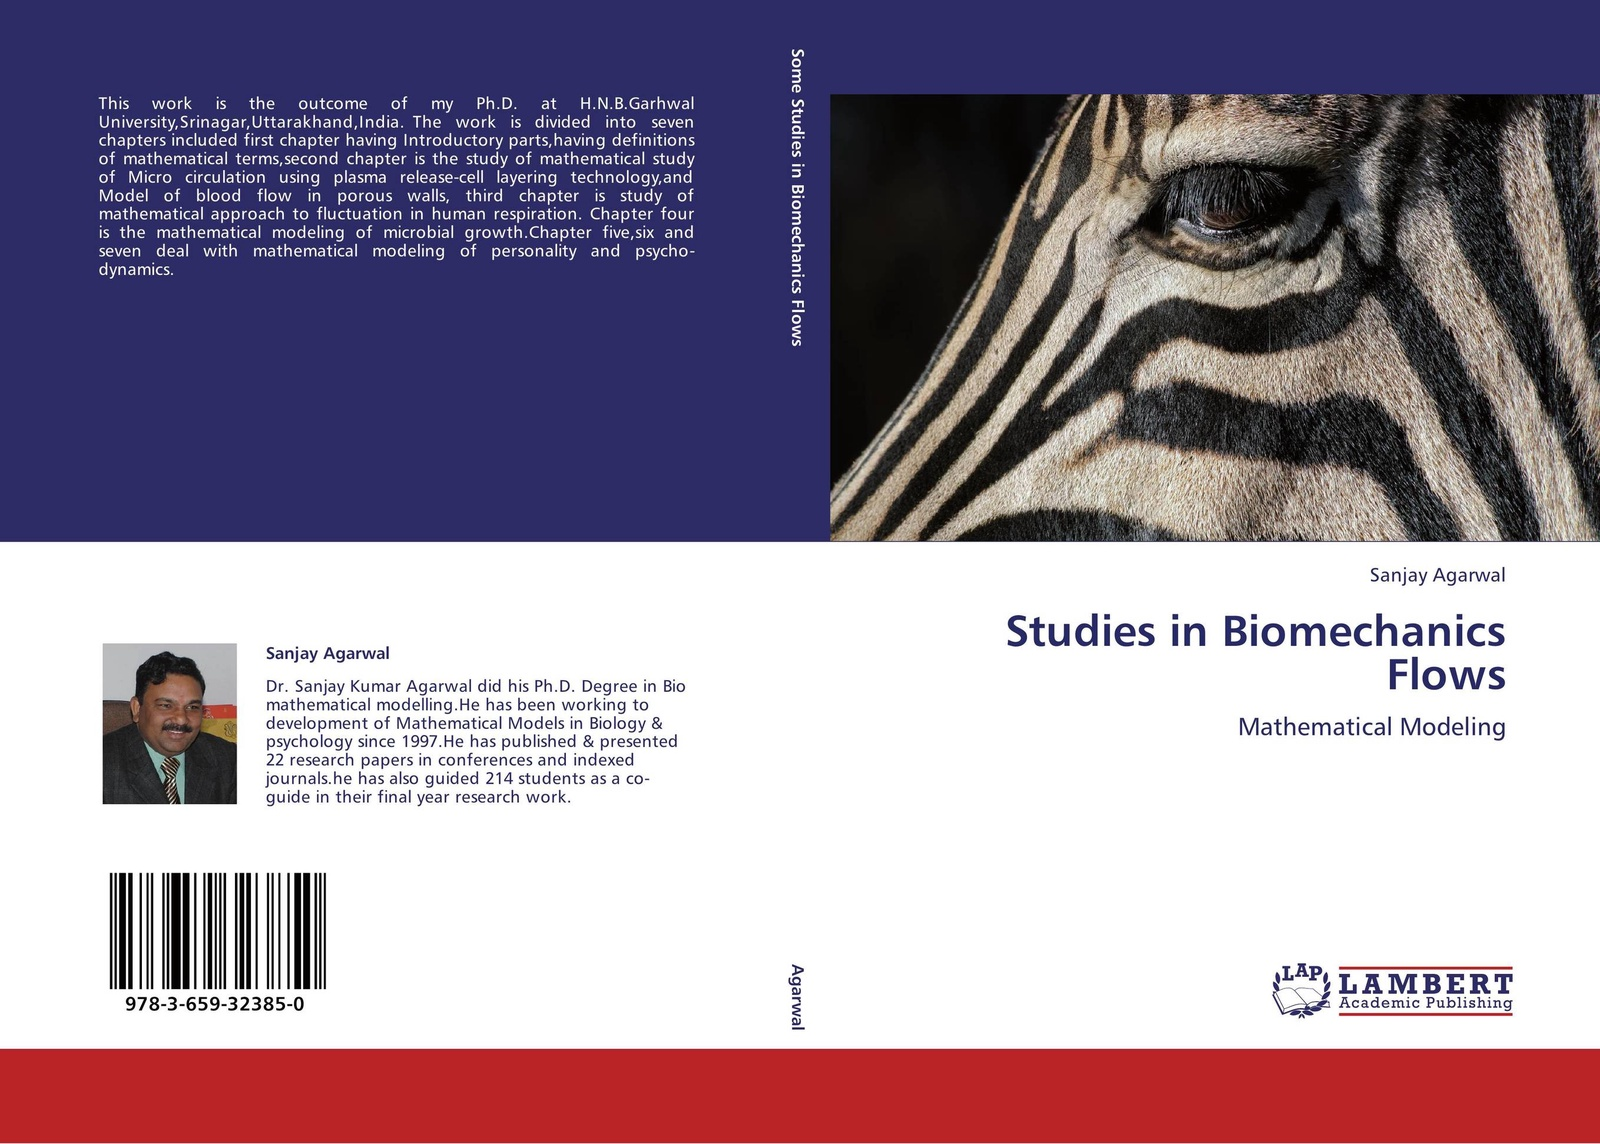 Sanjay Agarwal Studies in Biomechanics Flows r donati mathematical fundamentals of trajectory dynamics